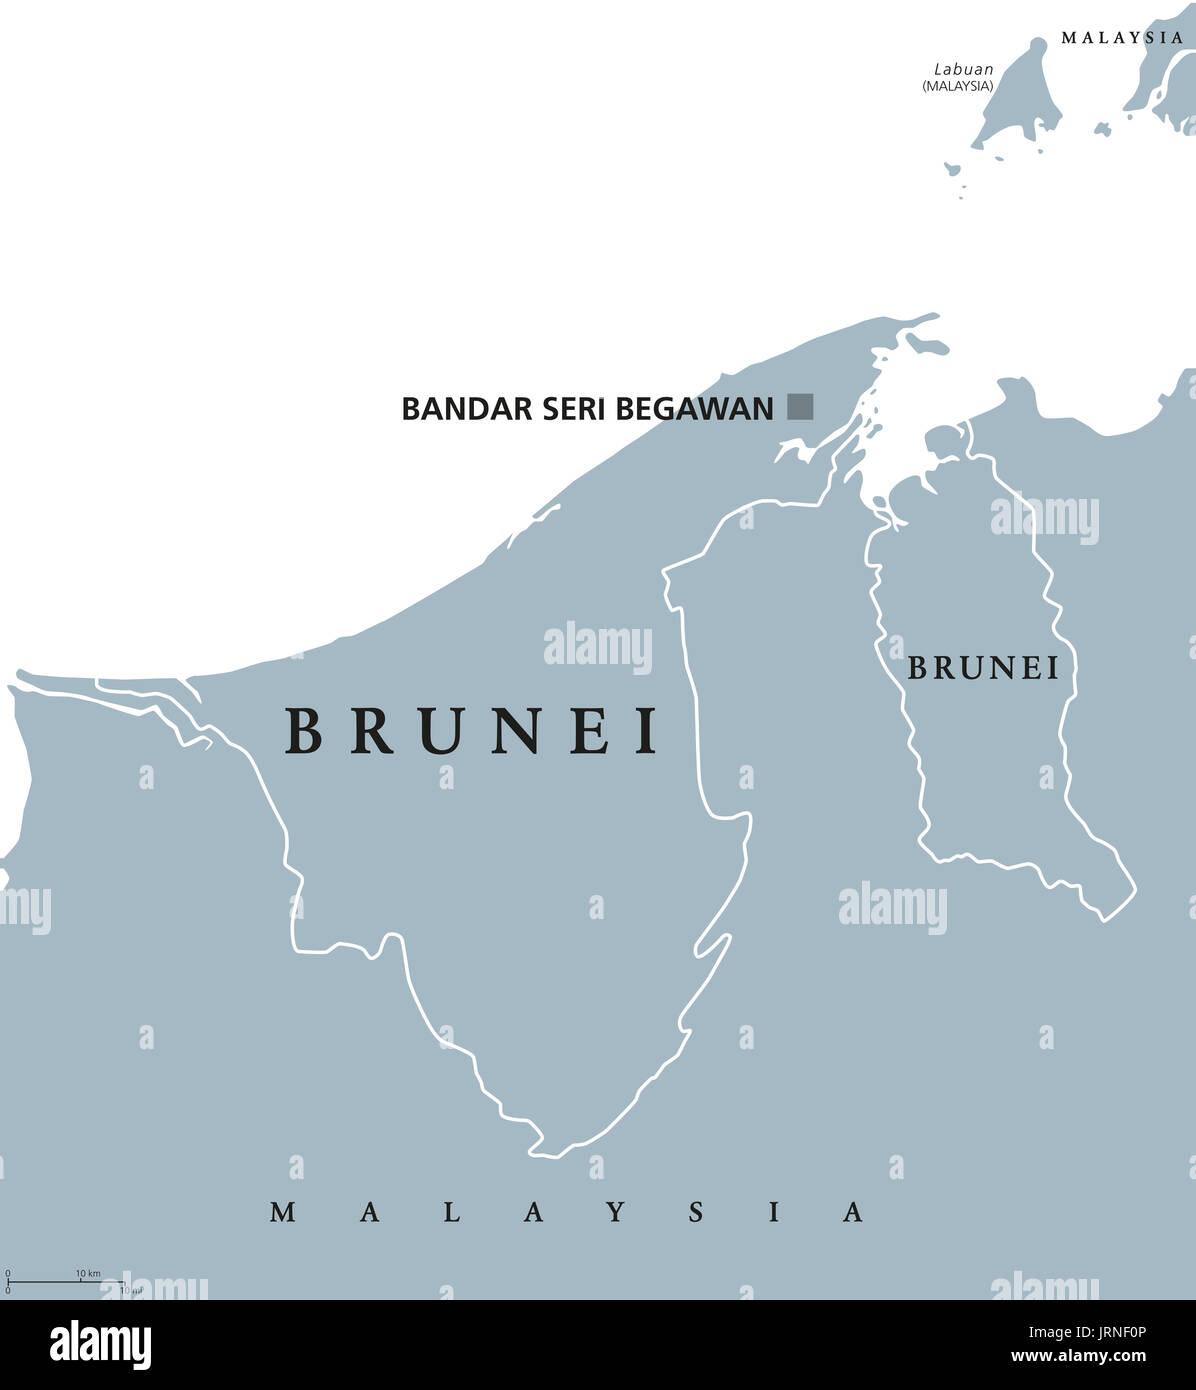 Brunei Political Map With Capital Bandar Seri Begawan English - Brunei map